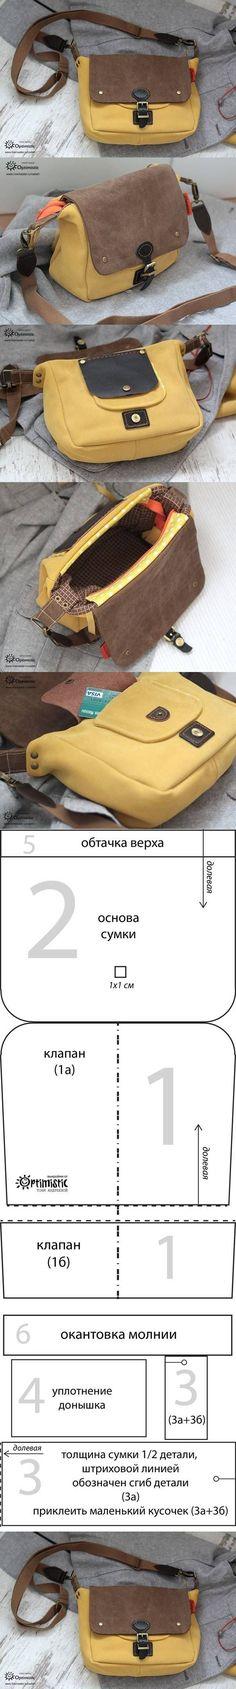 DIY Sew Bolsa Padrão Projetos DIY | UsefulDIY.com #handbagdiy